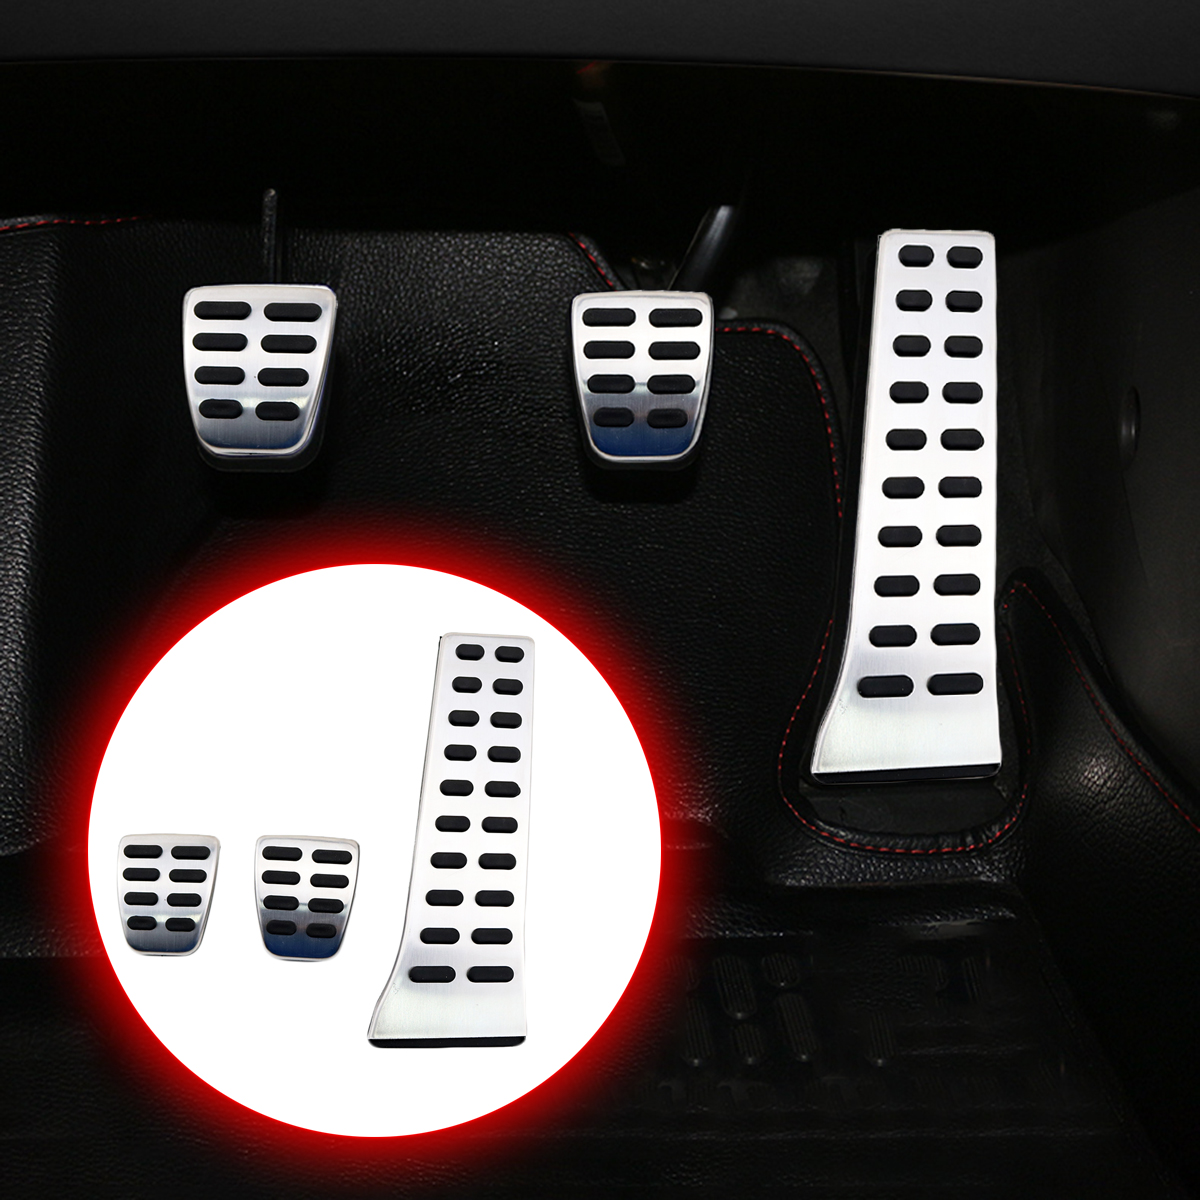 Fit For KIA K3S K3 K4 K5 Sportage Cadenza Sorento Accessories Clutch Brake Accelerator Gas Fuel Pedal Antiskid Cover Set